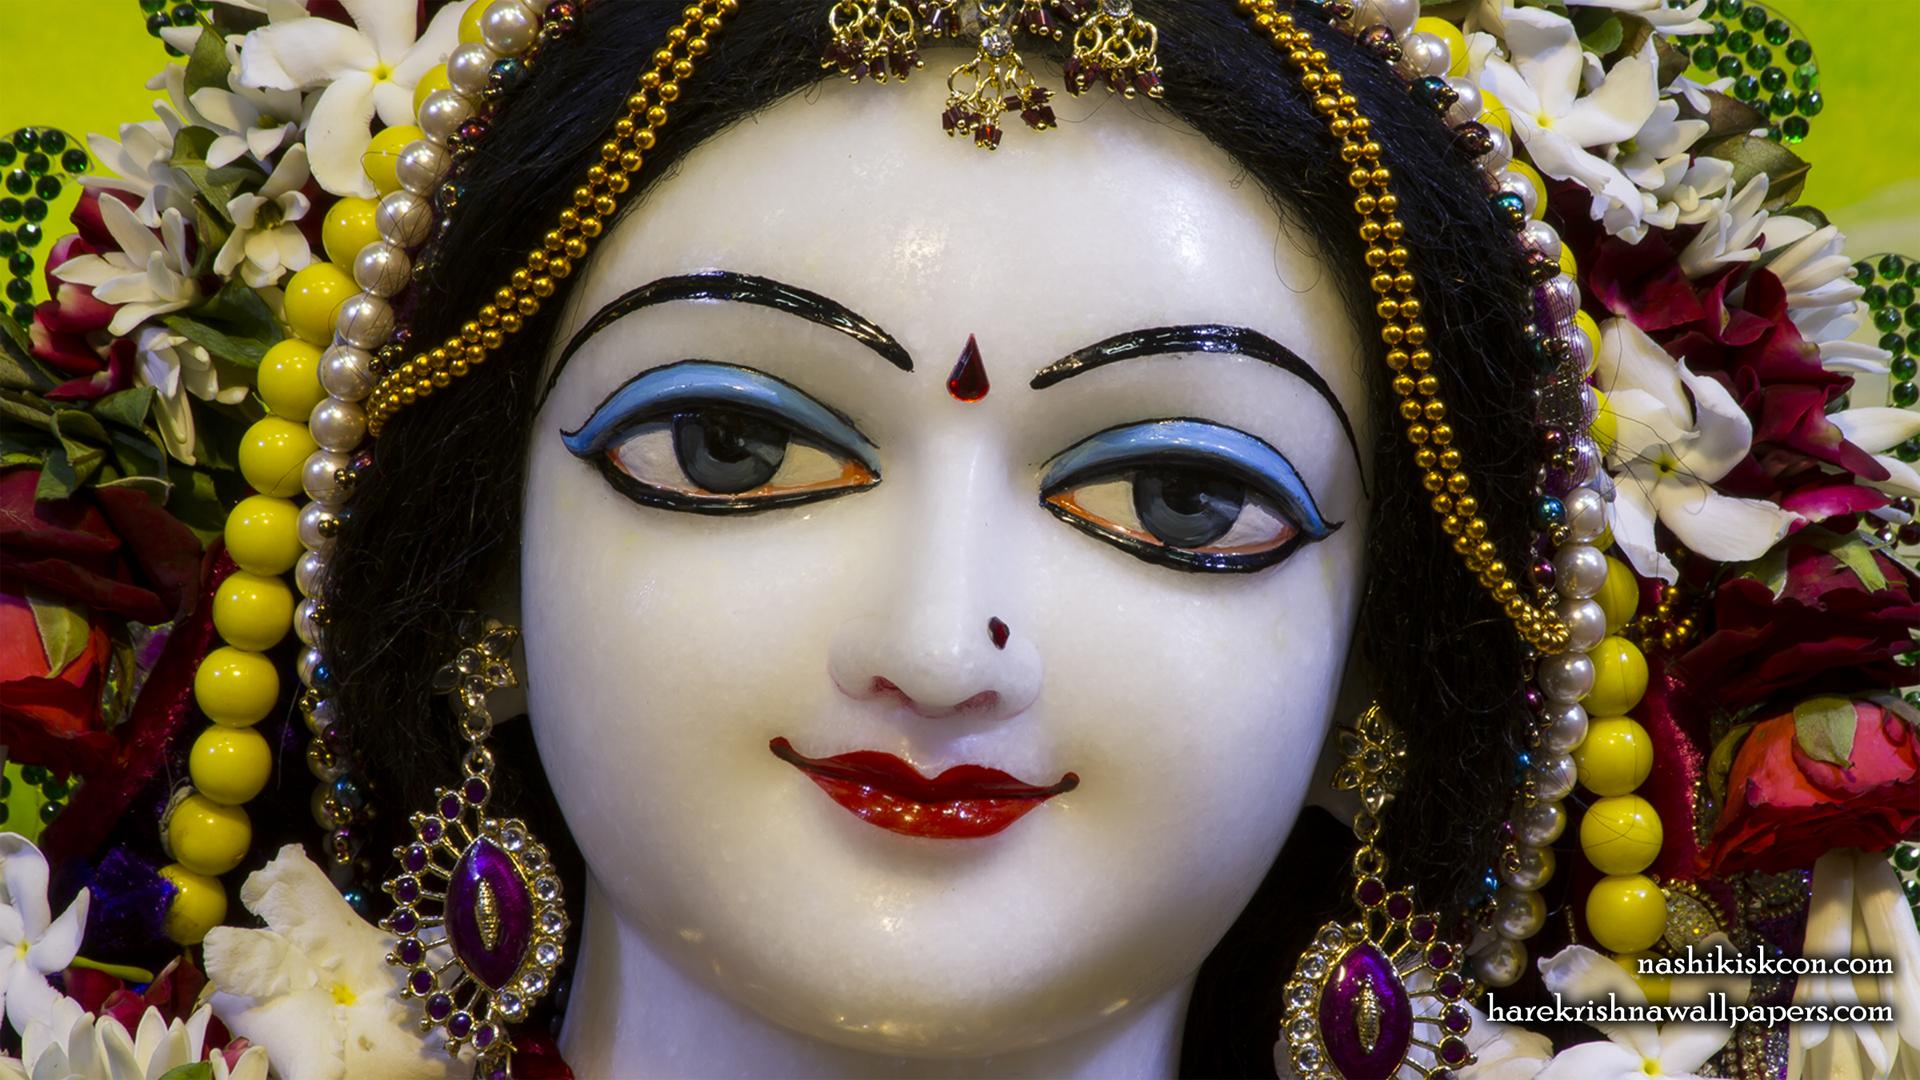 Sri Radha Close up Wallpaper (011) Size 1920x1080 Download